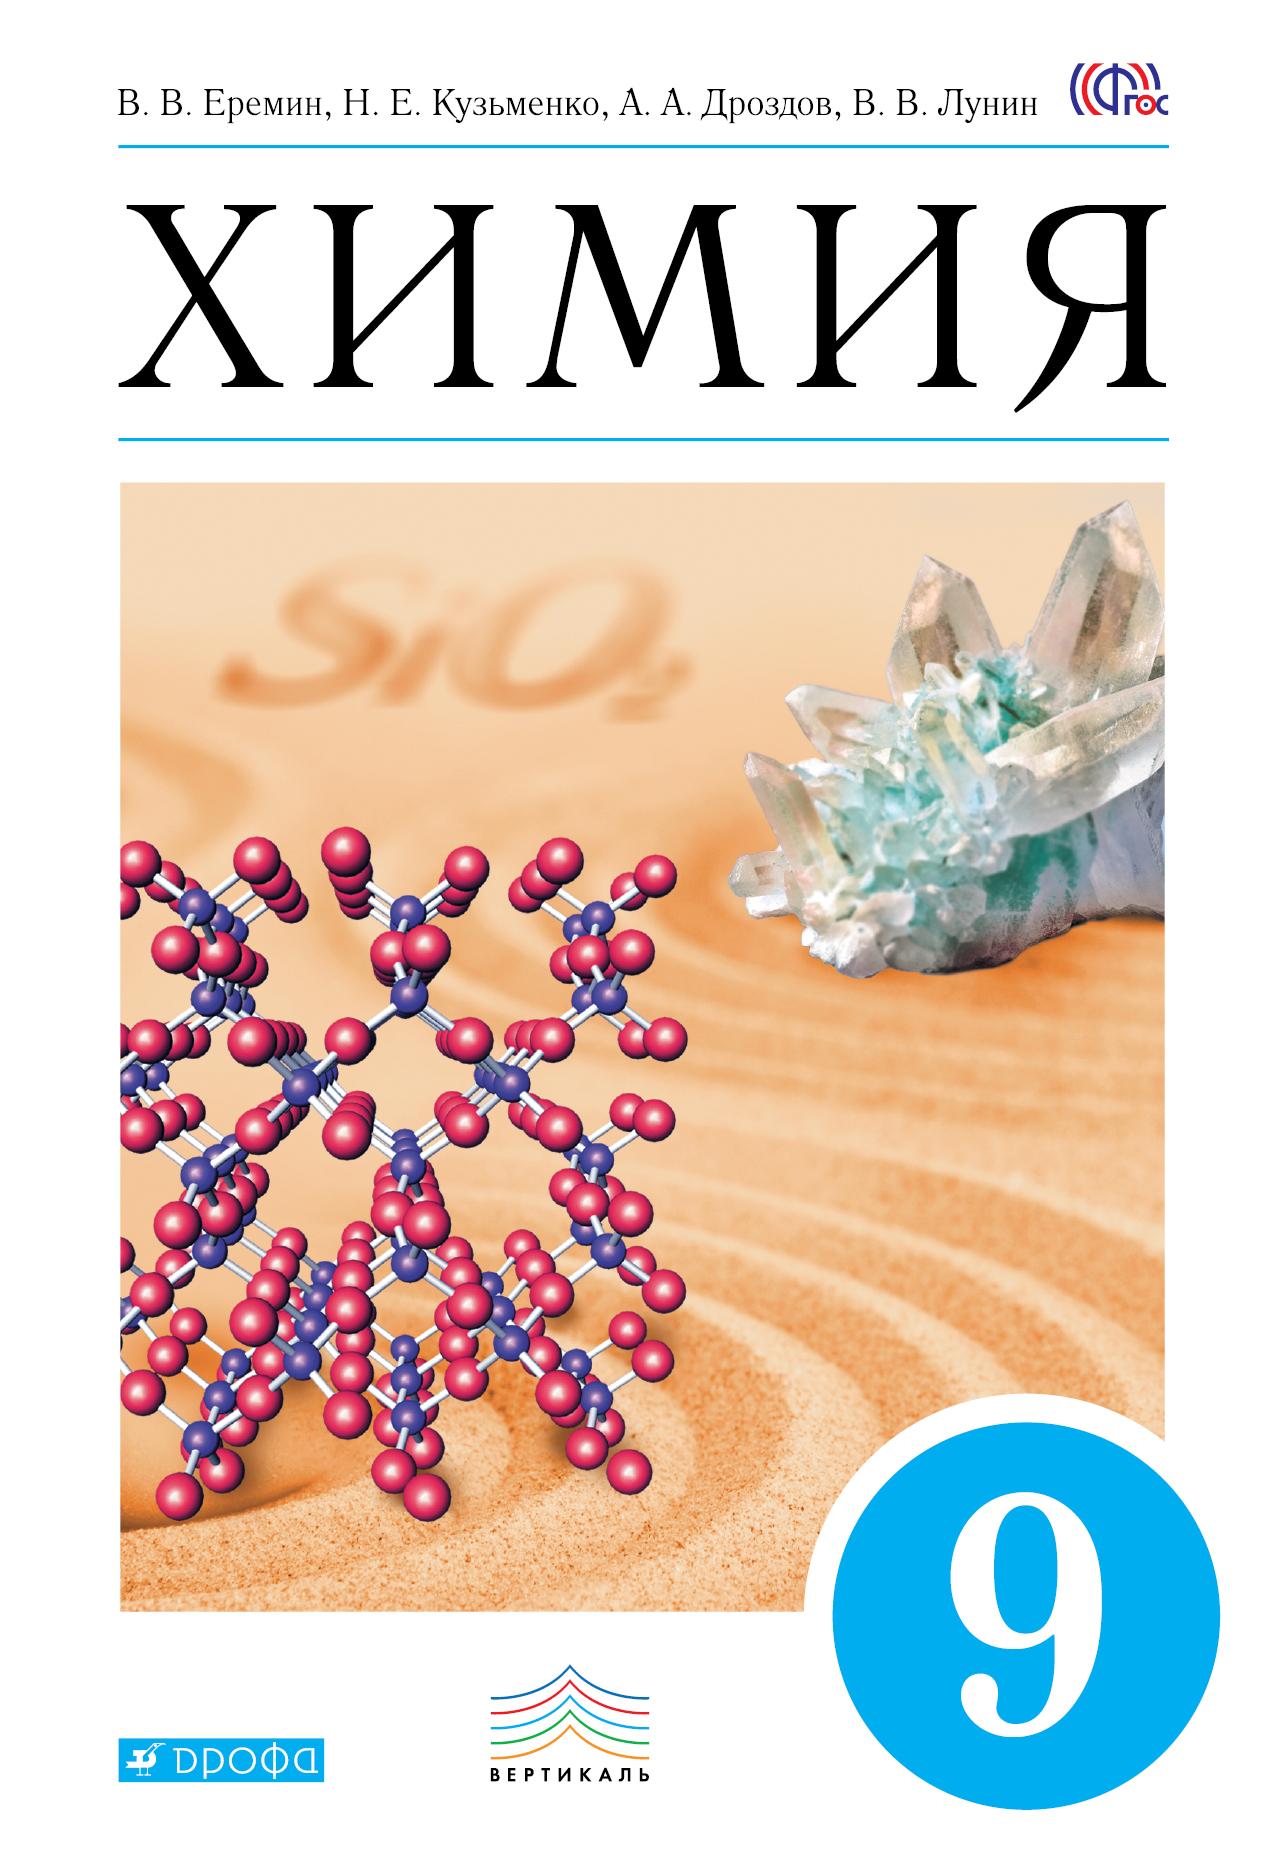 Химия 9кл [Учебник] Вертикаль ФП